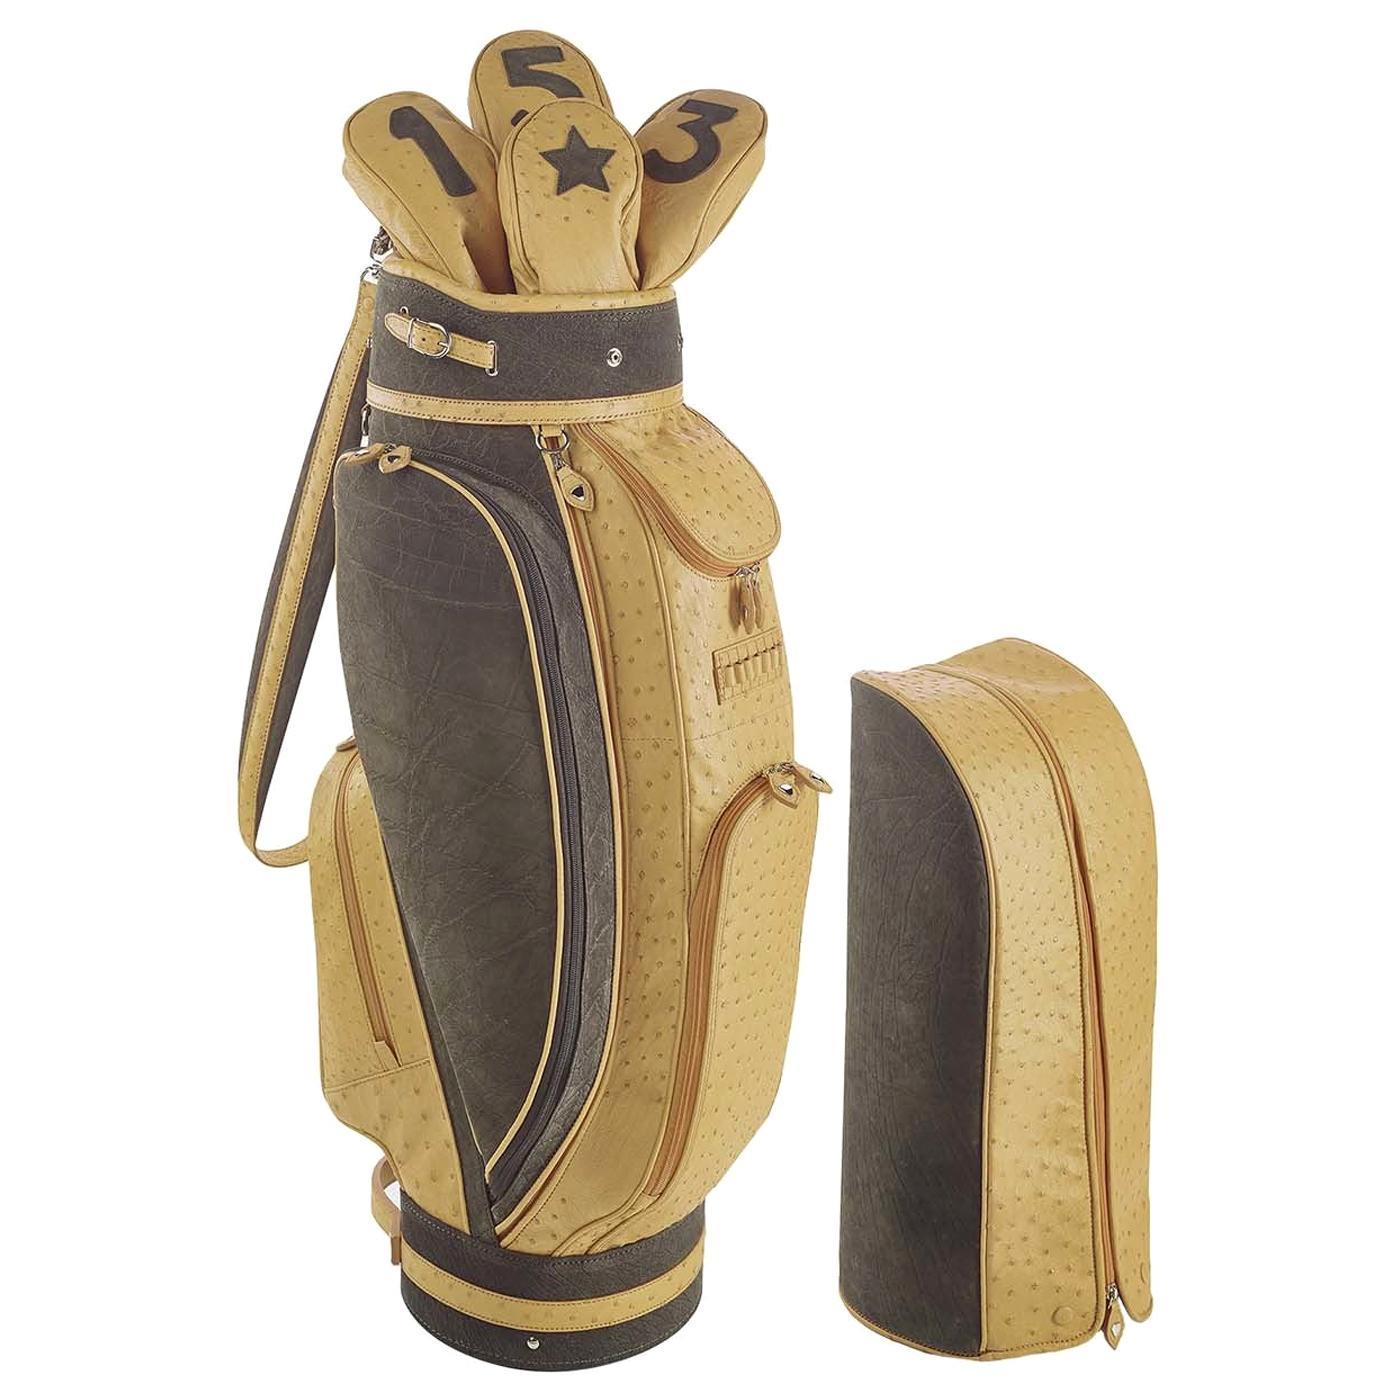 Royal Camel Golf Bag by Barchi